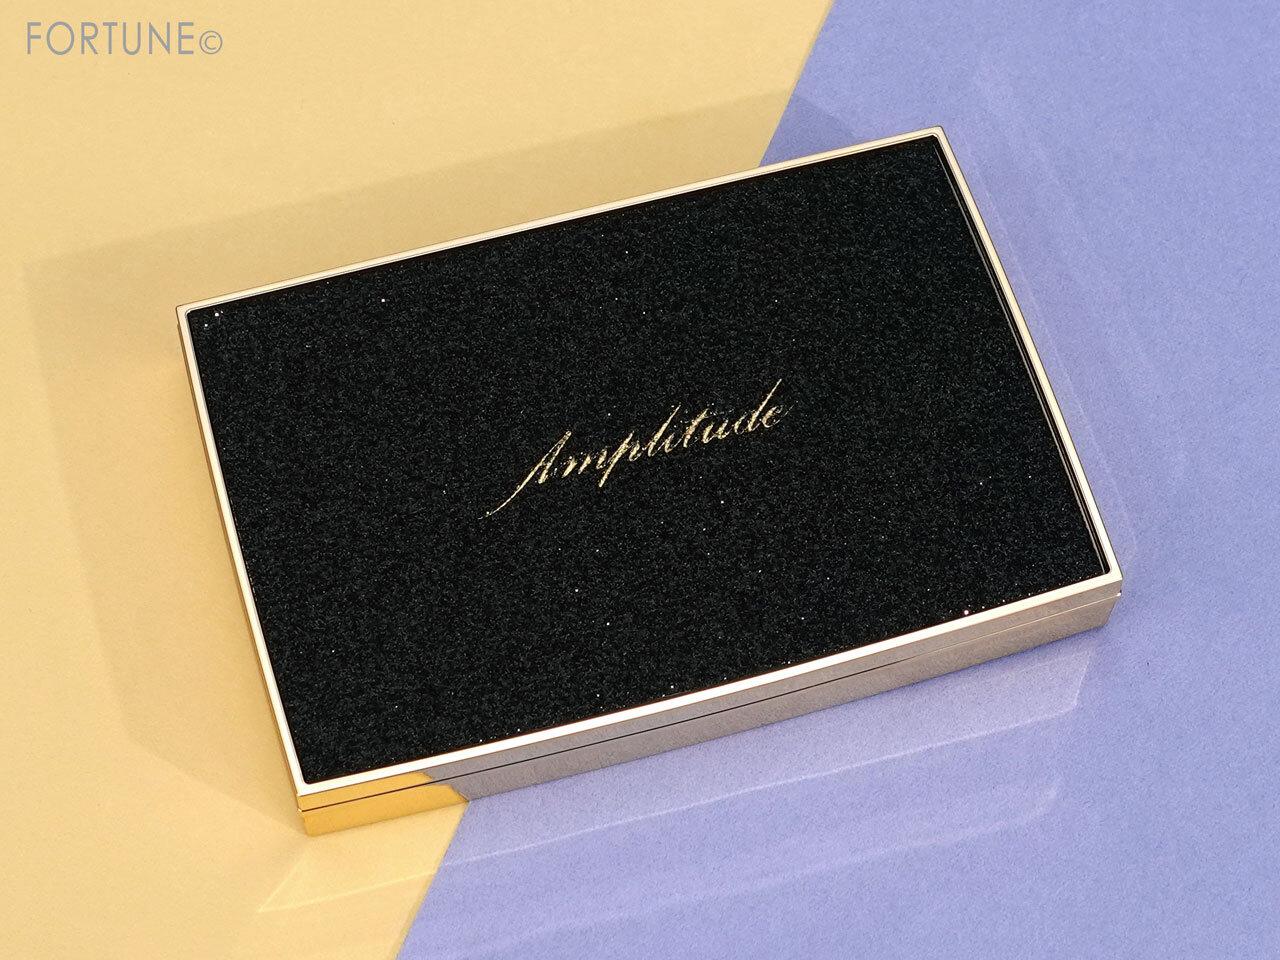 Amplitude(アンプリチュード)アイカラーパレット リミテッドコレクション a